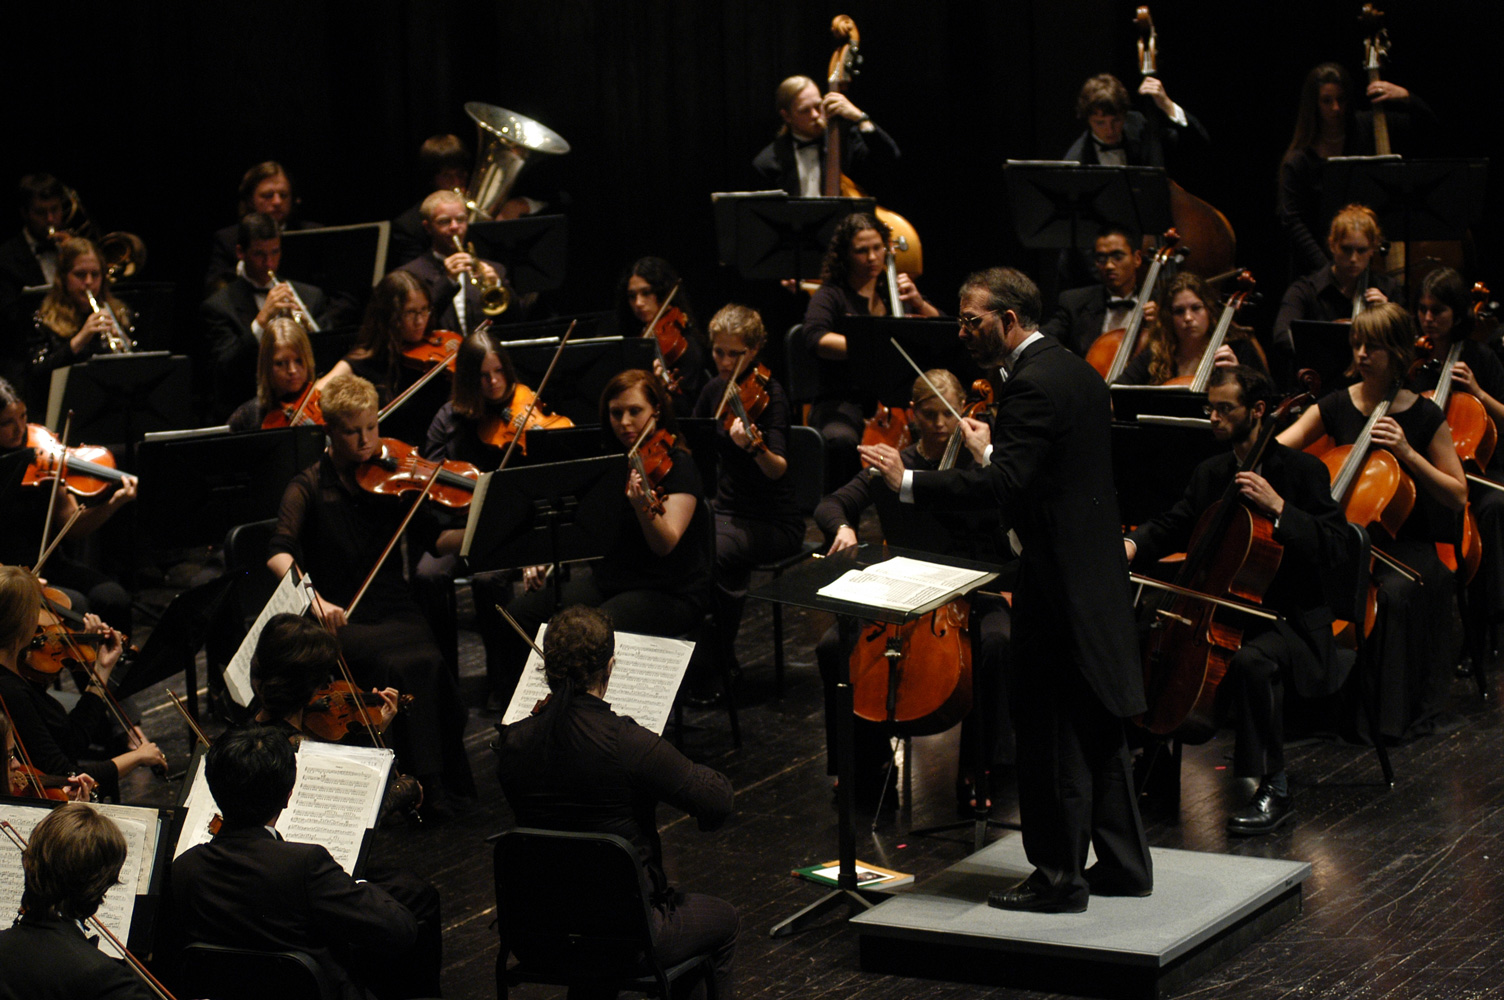 Orchestra concert to benefit Joplin high school